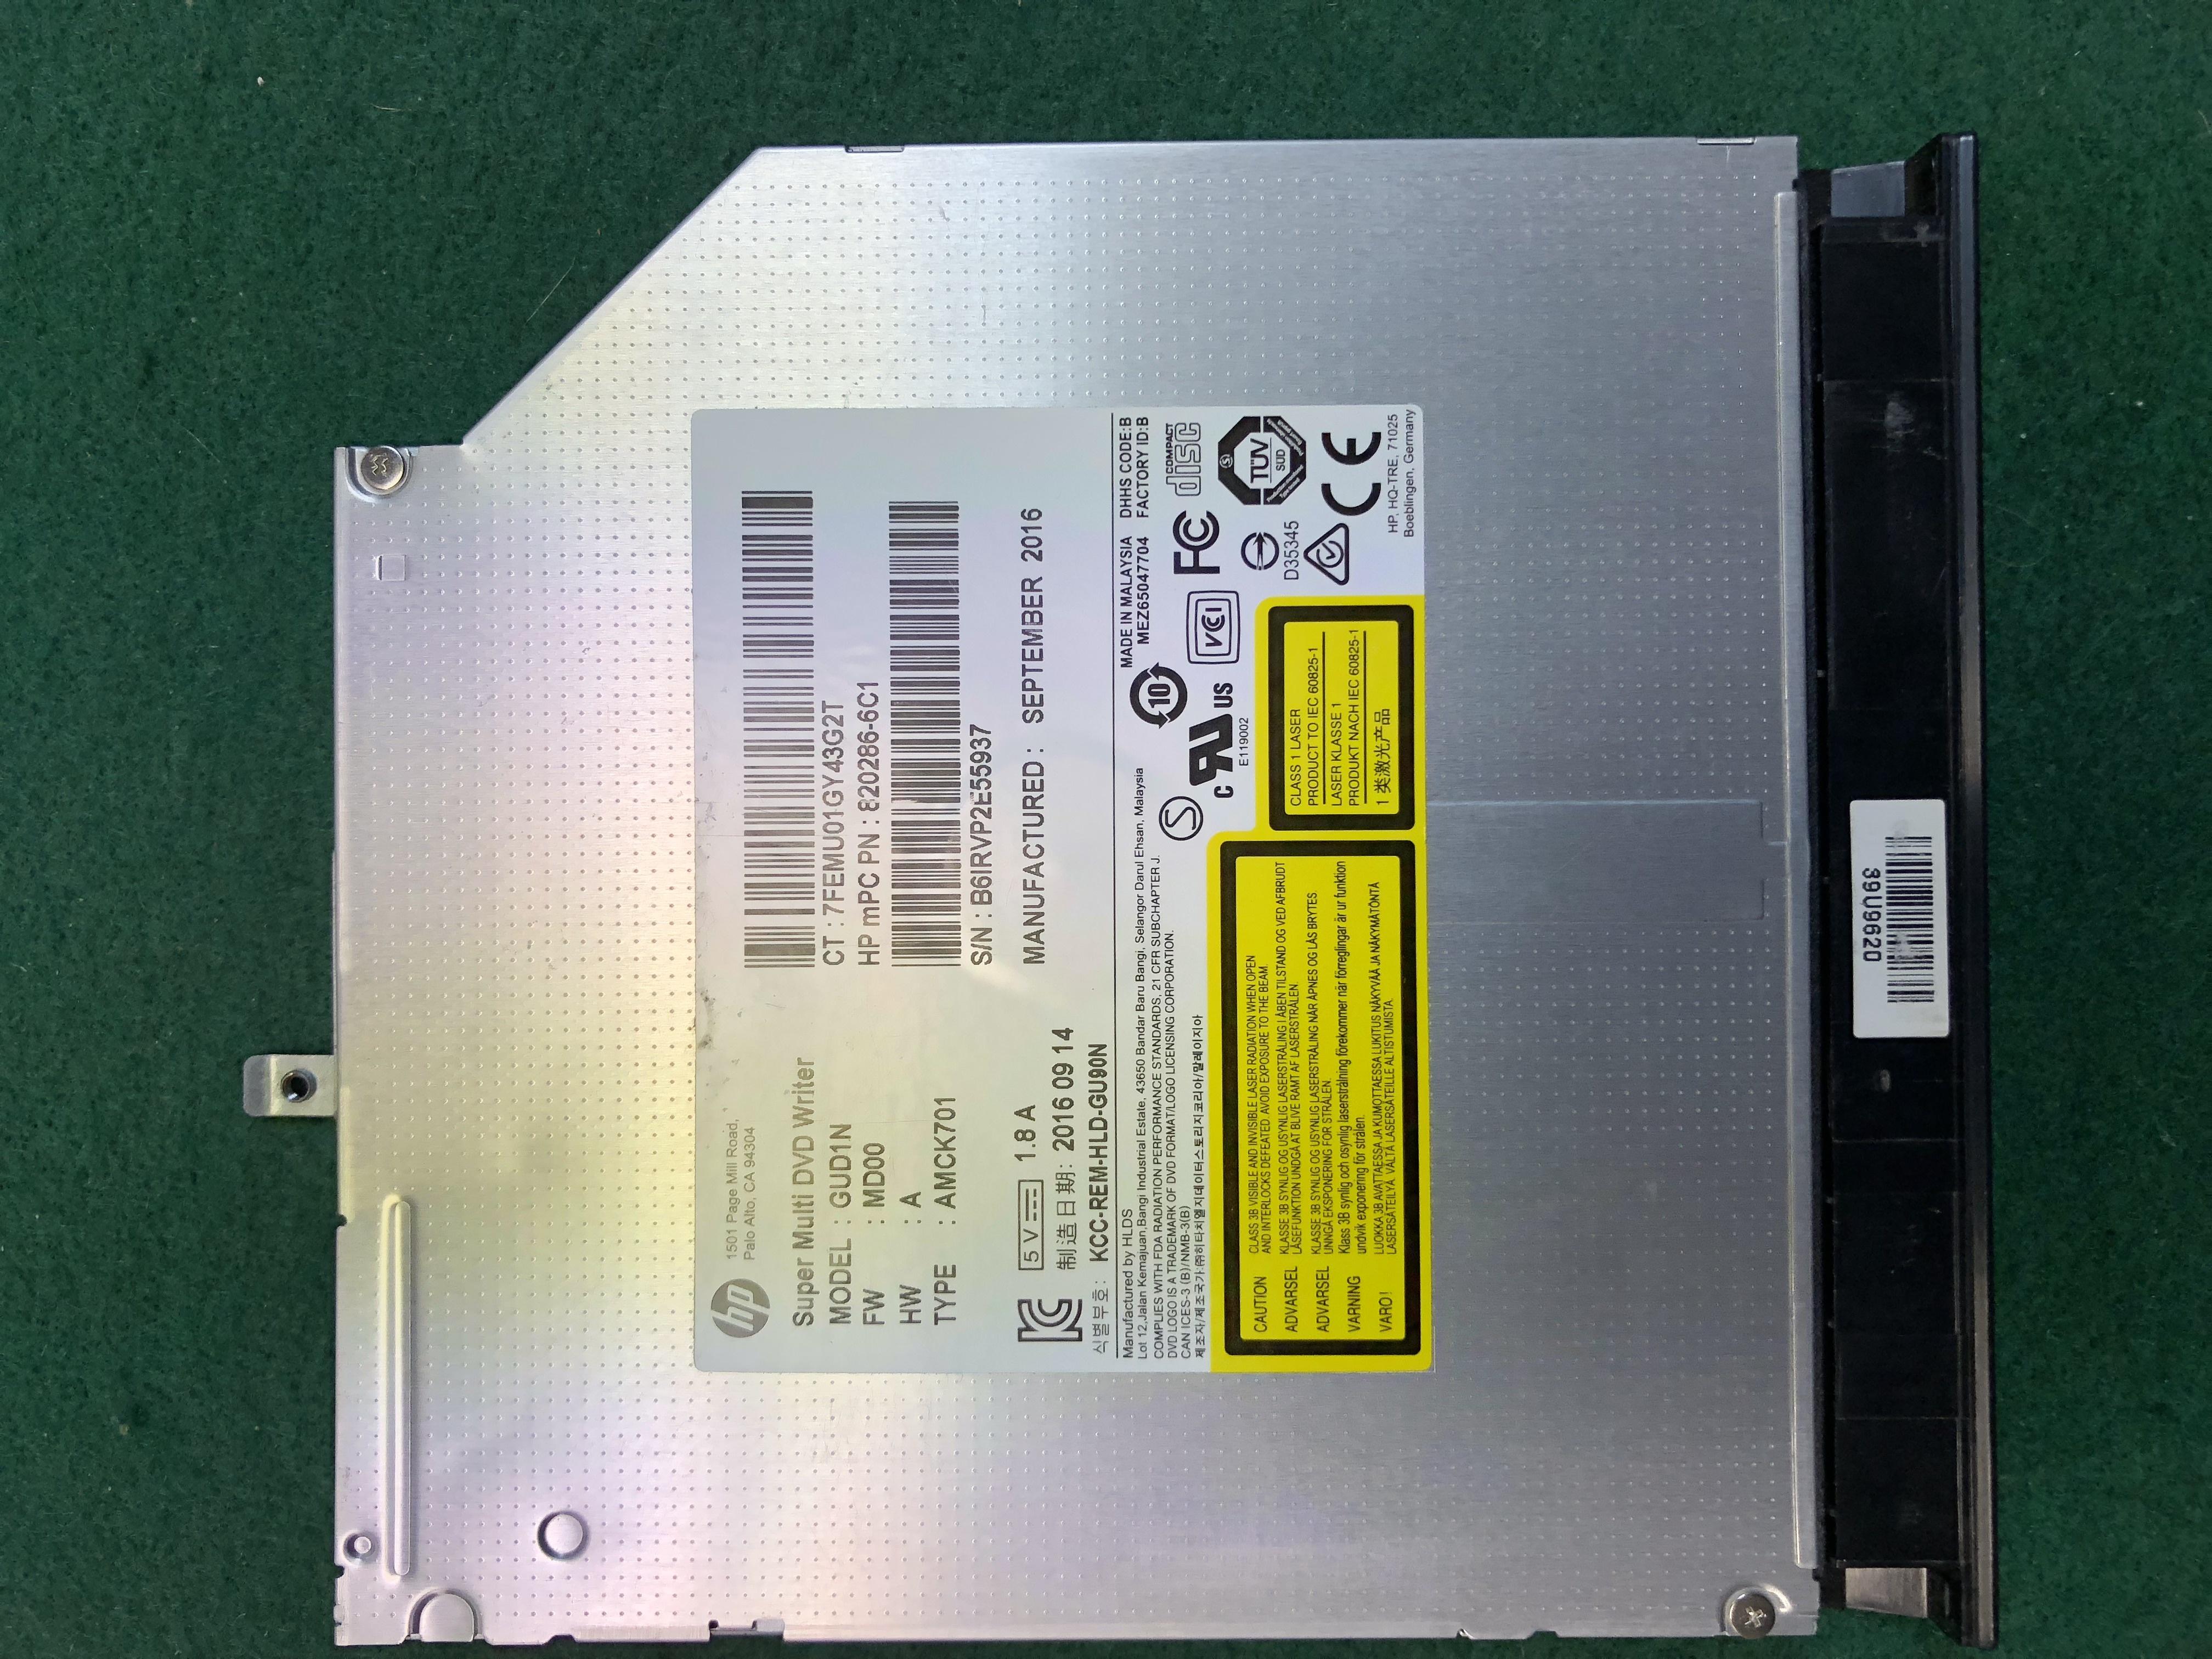 HP Super Multi DVD Writer GUD1N